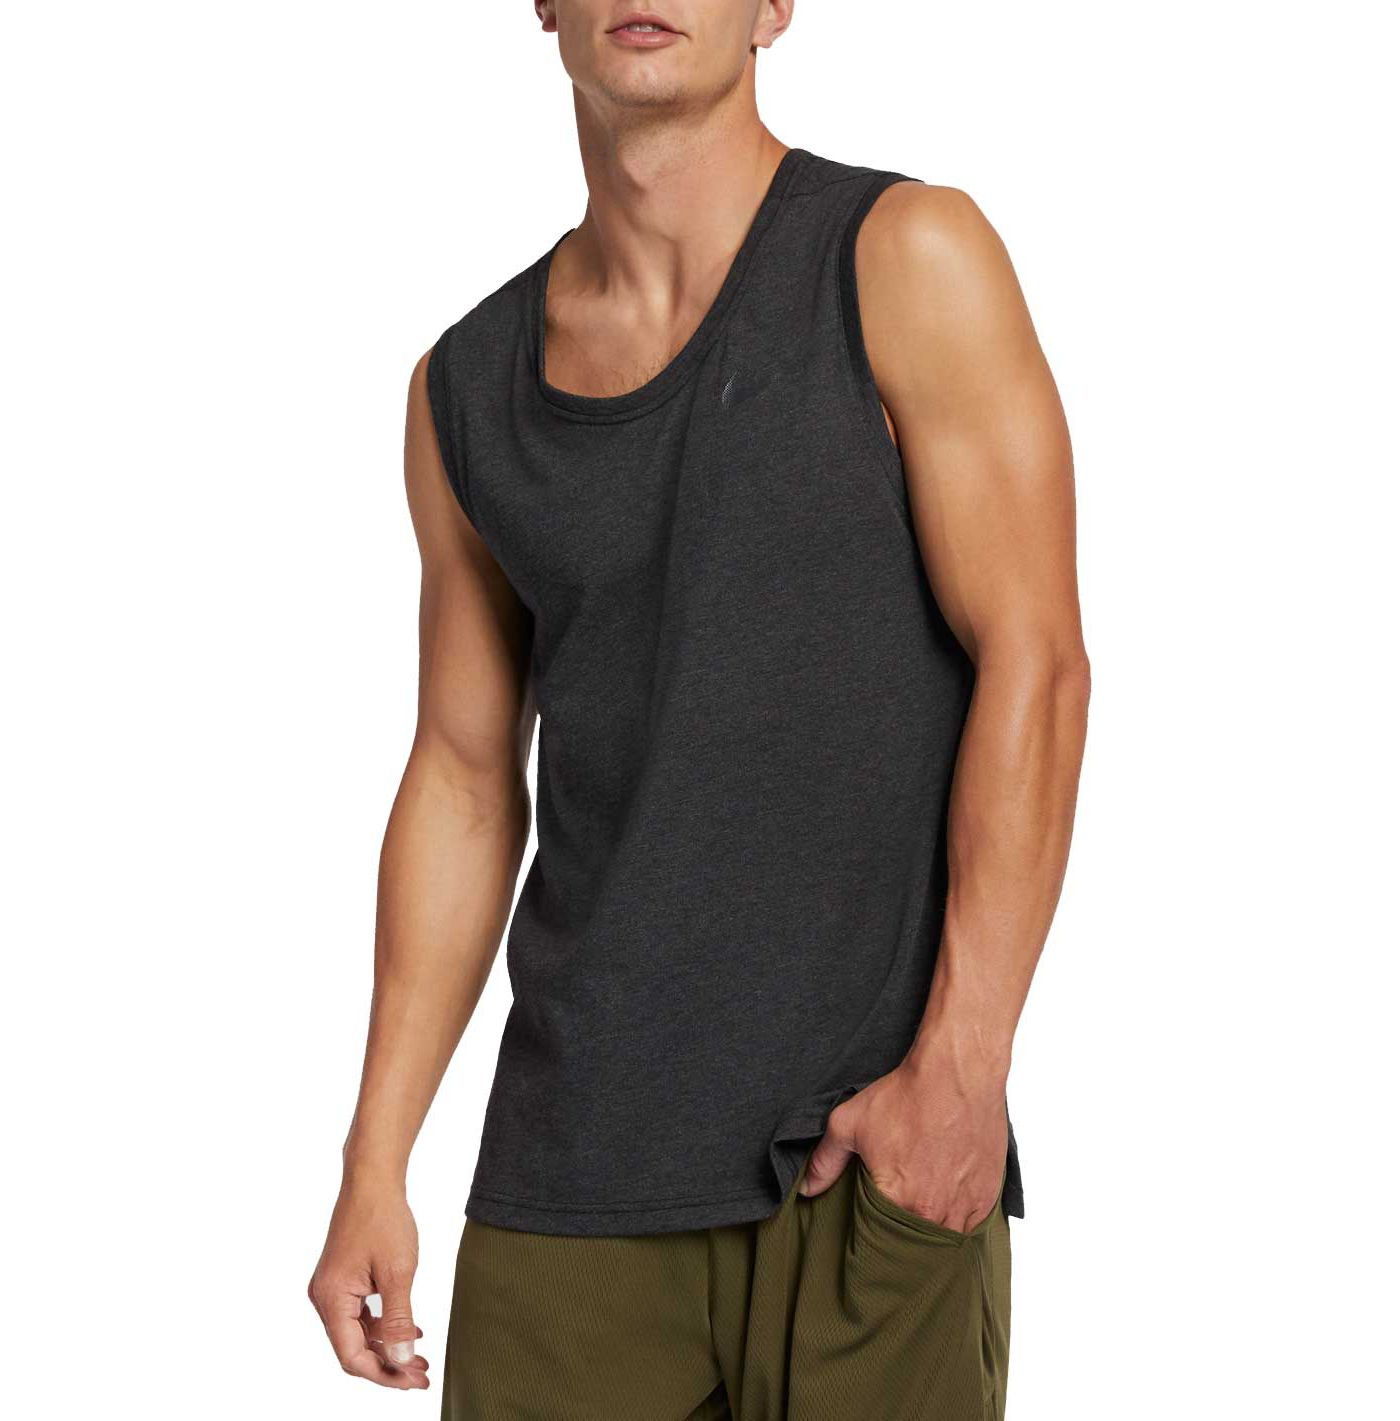 Nike Men's Hyper Dry Training Tank Top